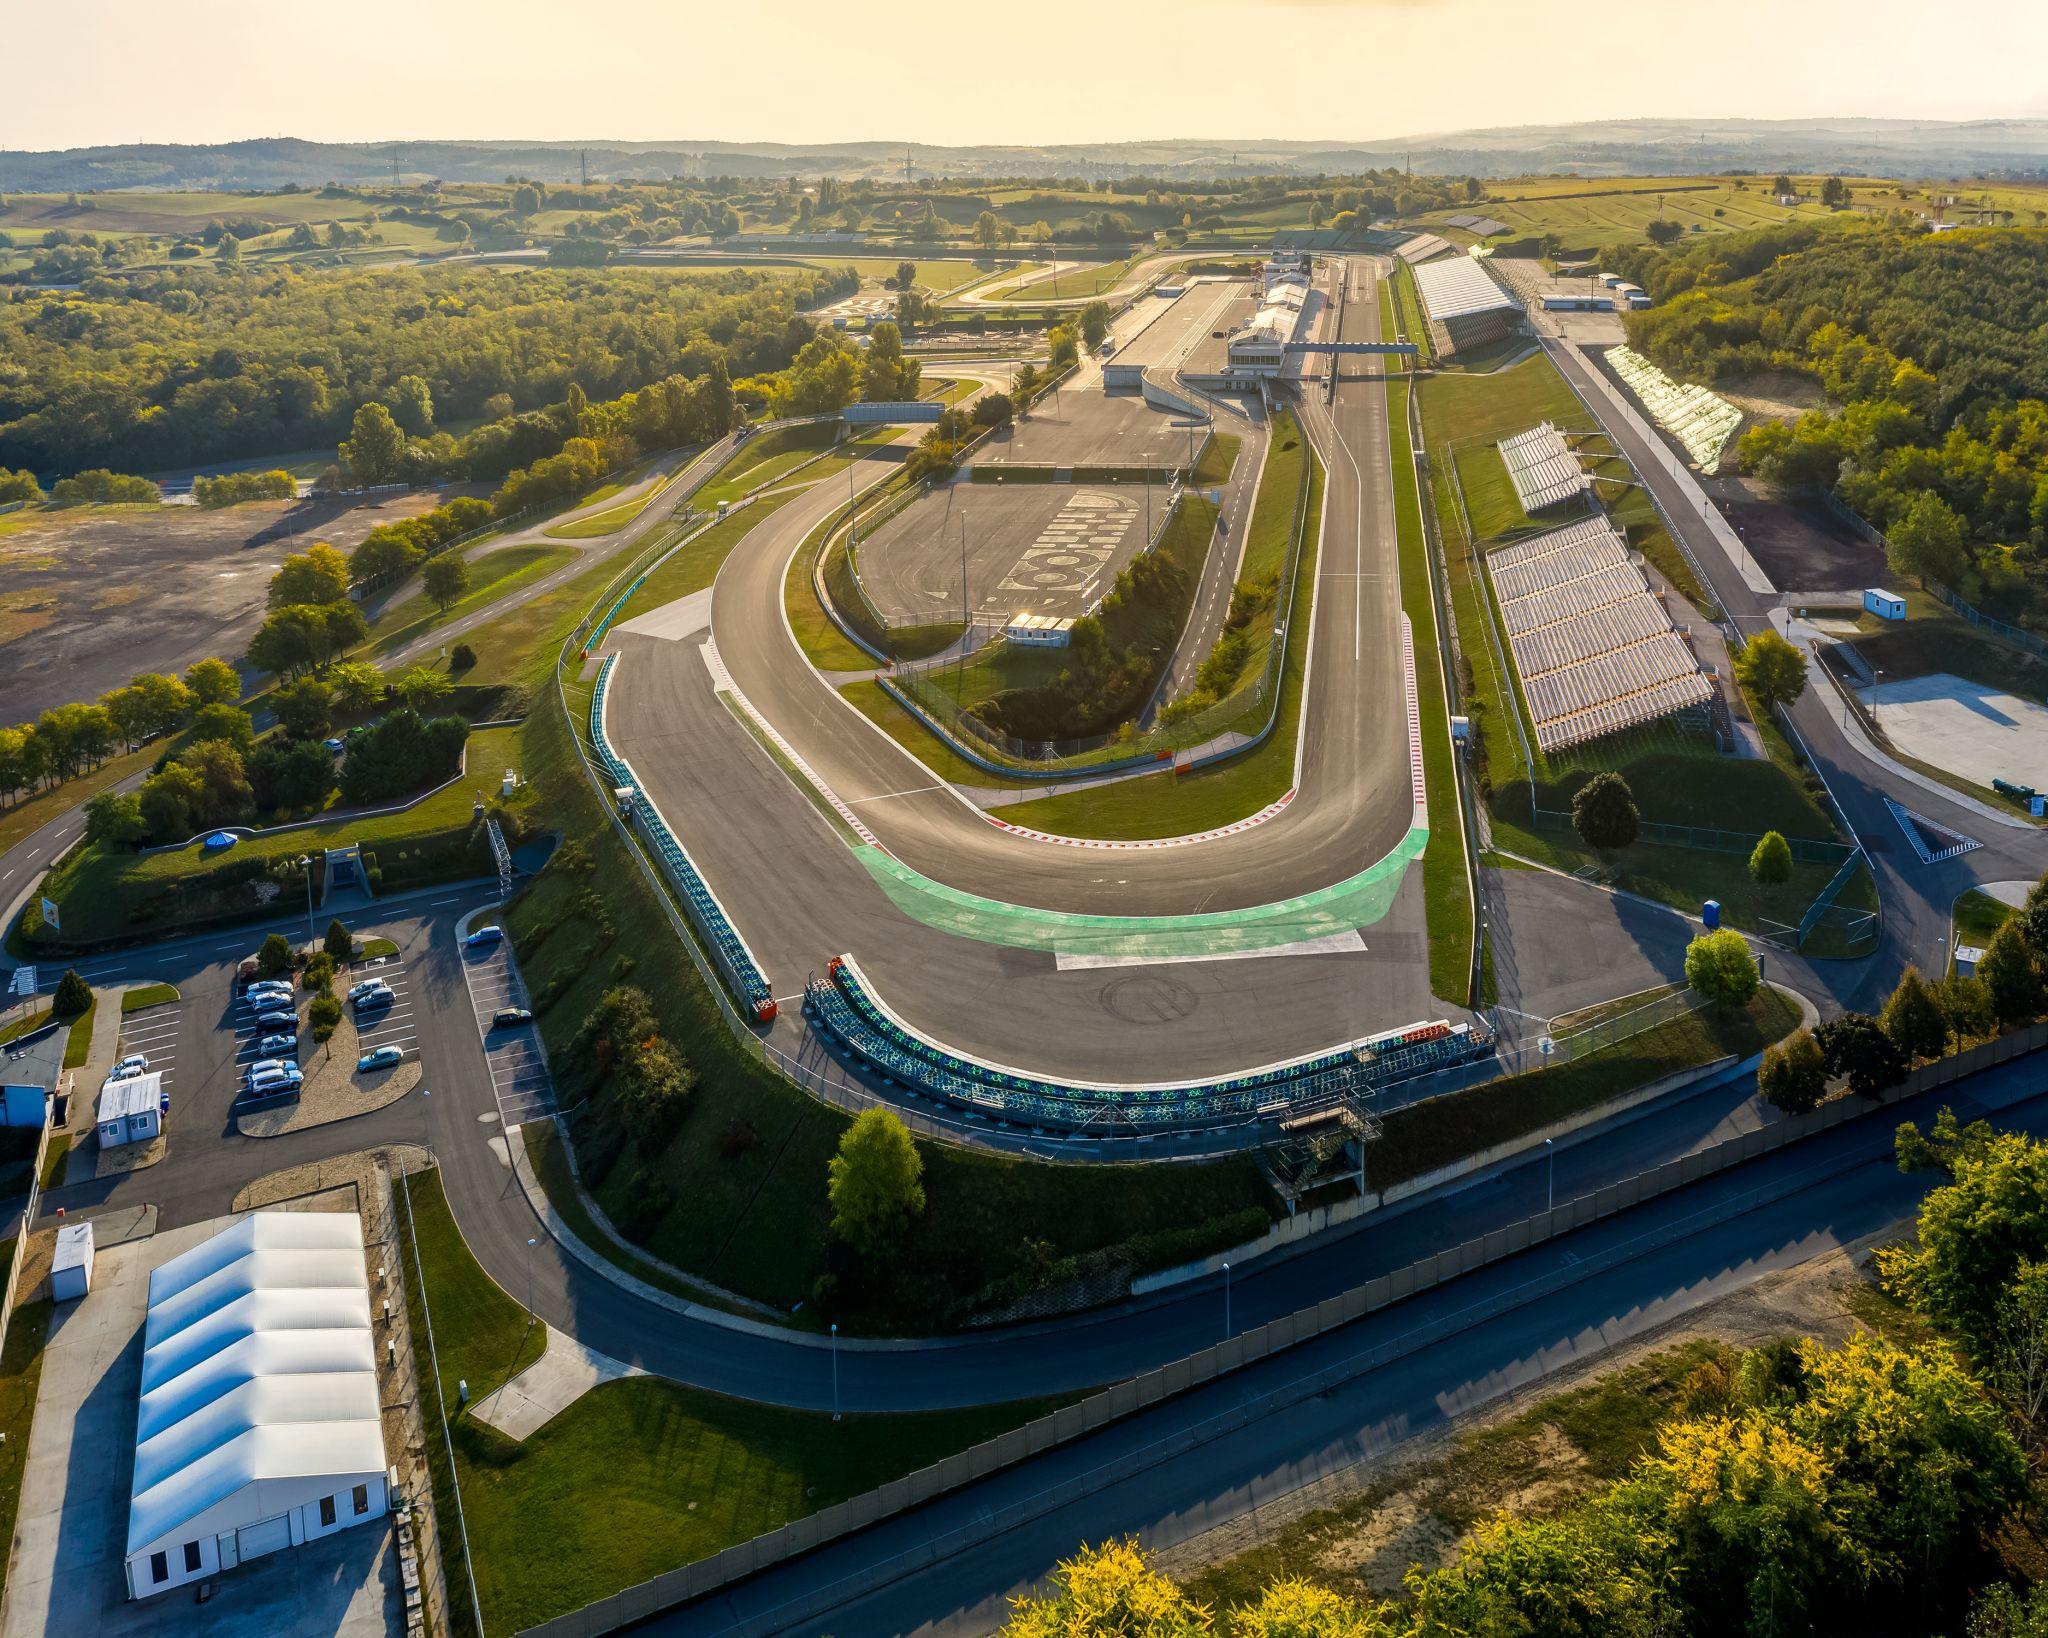 Hungaroring. The Hungarian F1 race track, Hungary